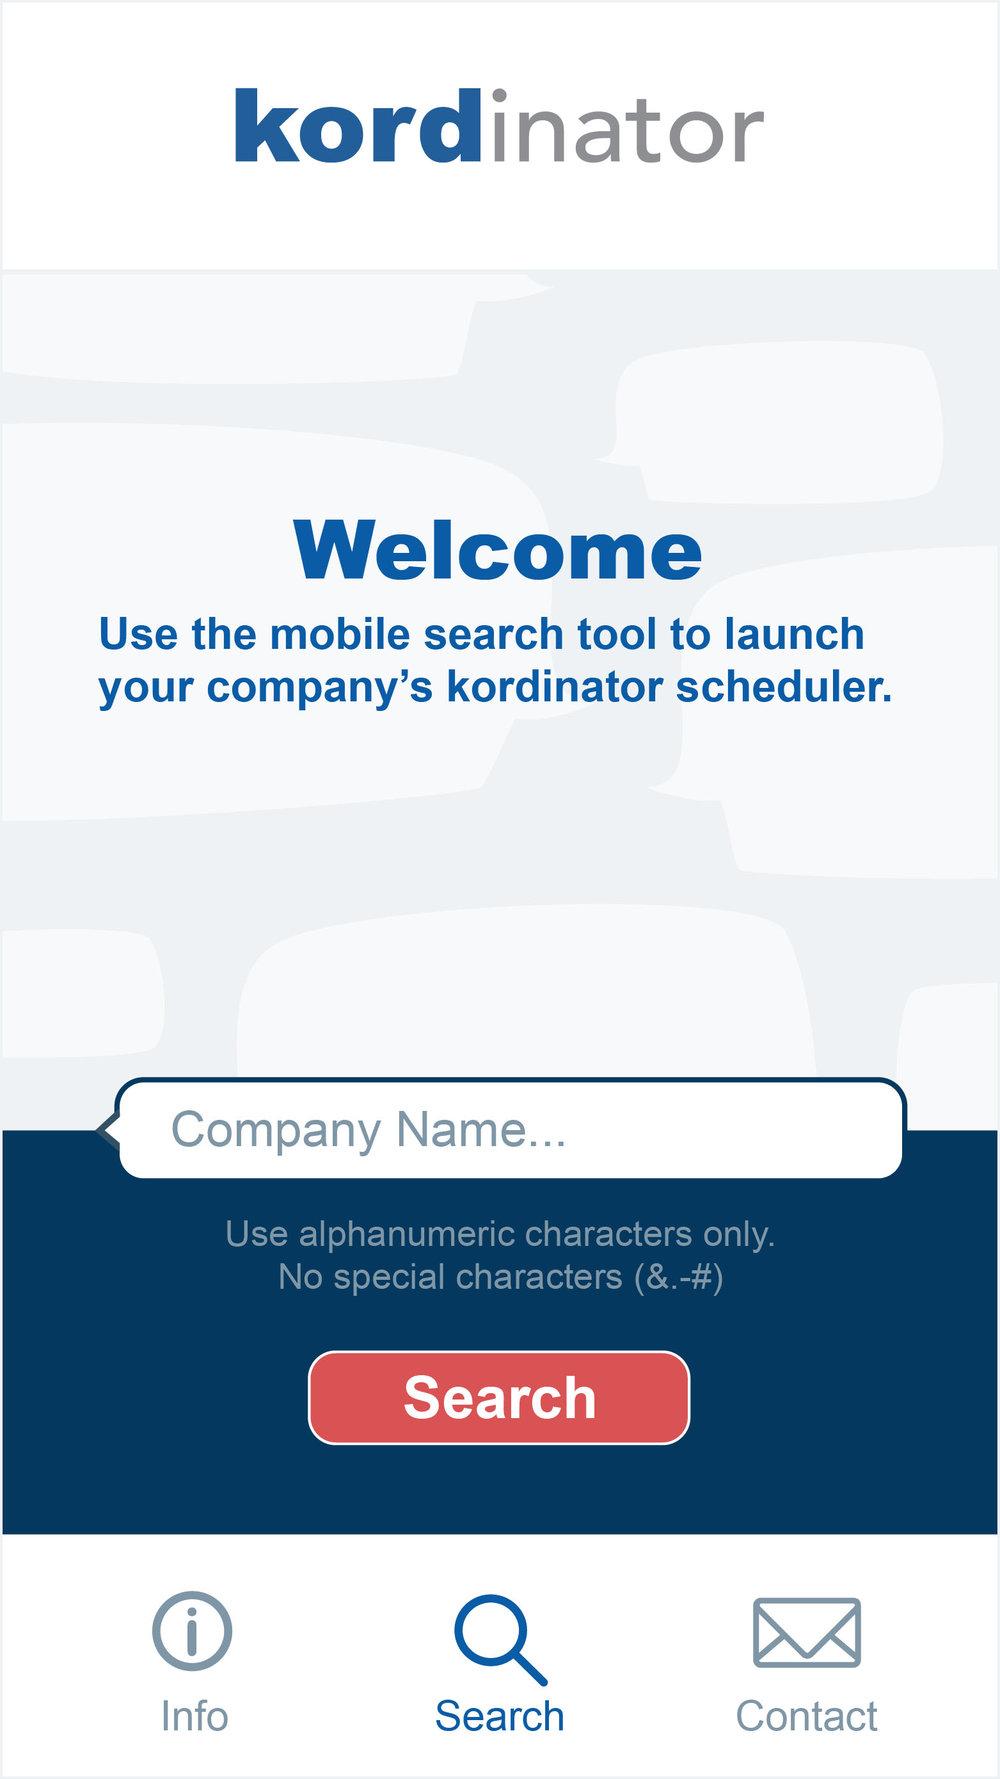 KordLauchAppFolio_Search & Welcome Screen.jpg